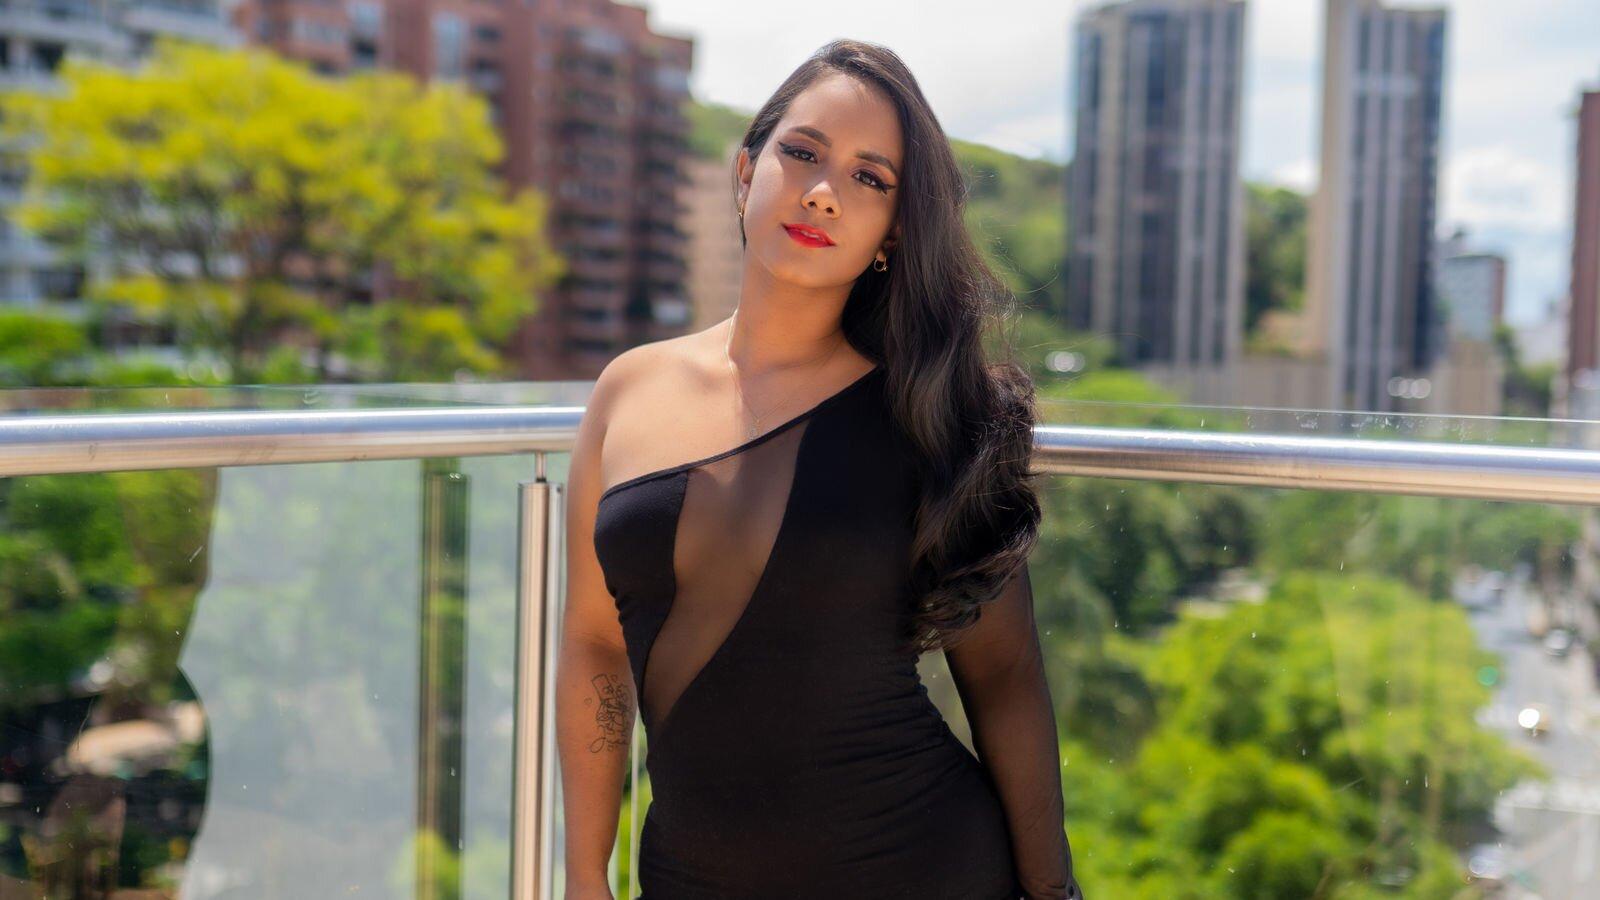 NataliaRouce